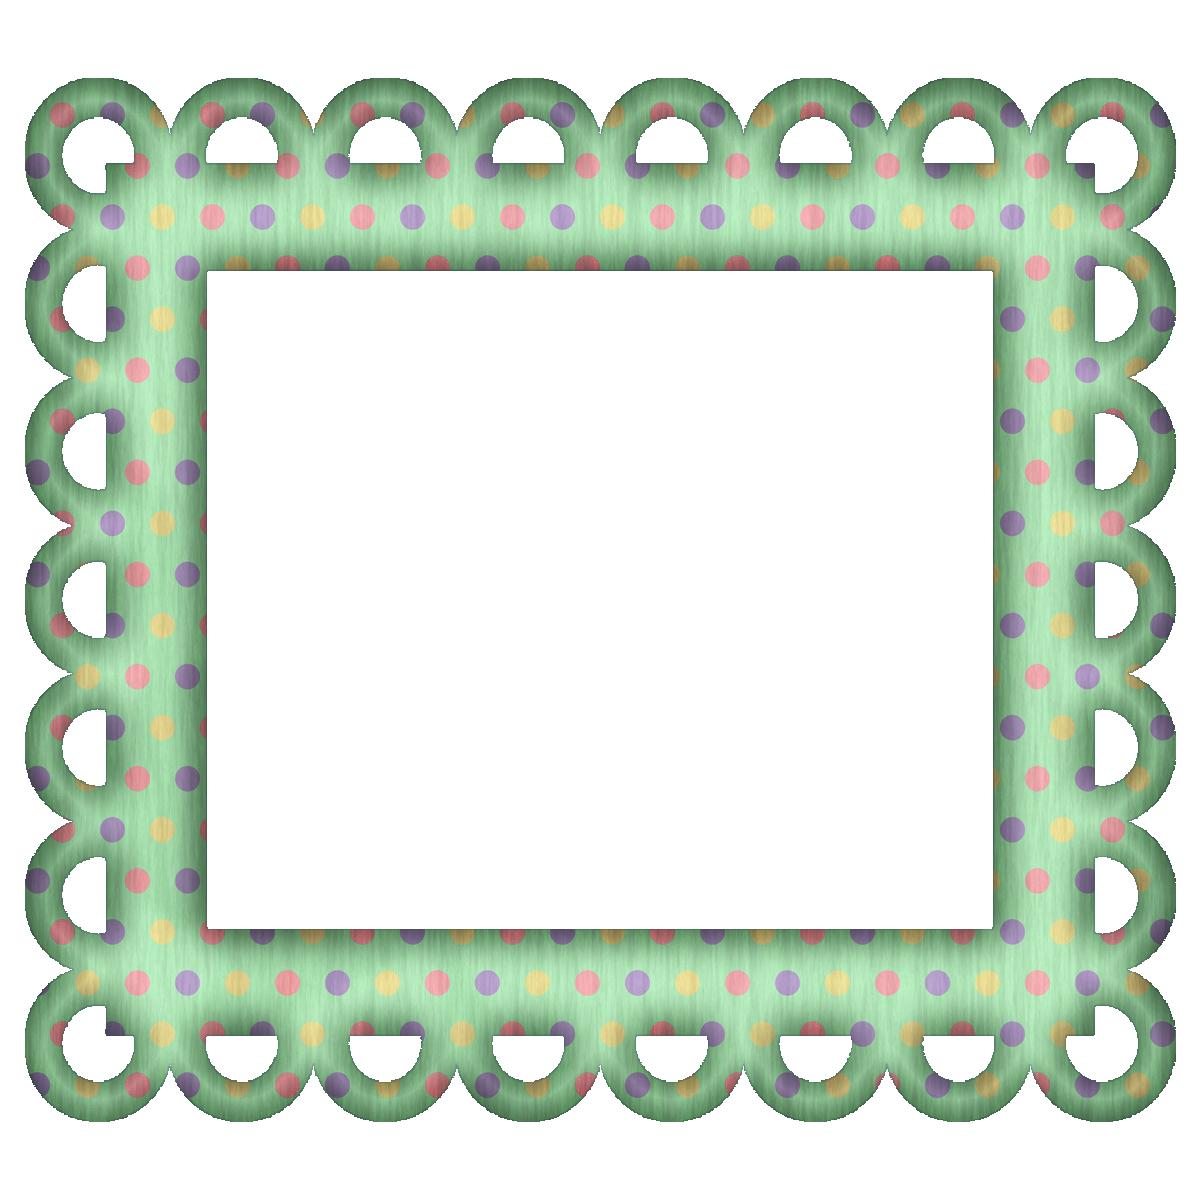 Picture Frames For Scrapbooking Free Free Green Polka Digi Scrapbook Frame Scrapbook Frame Scrapbook Frames Printable Frames